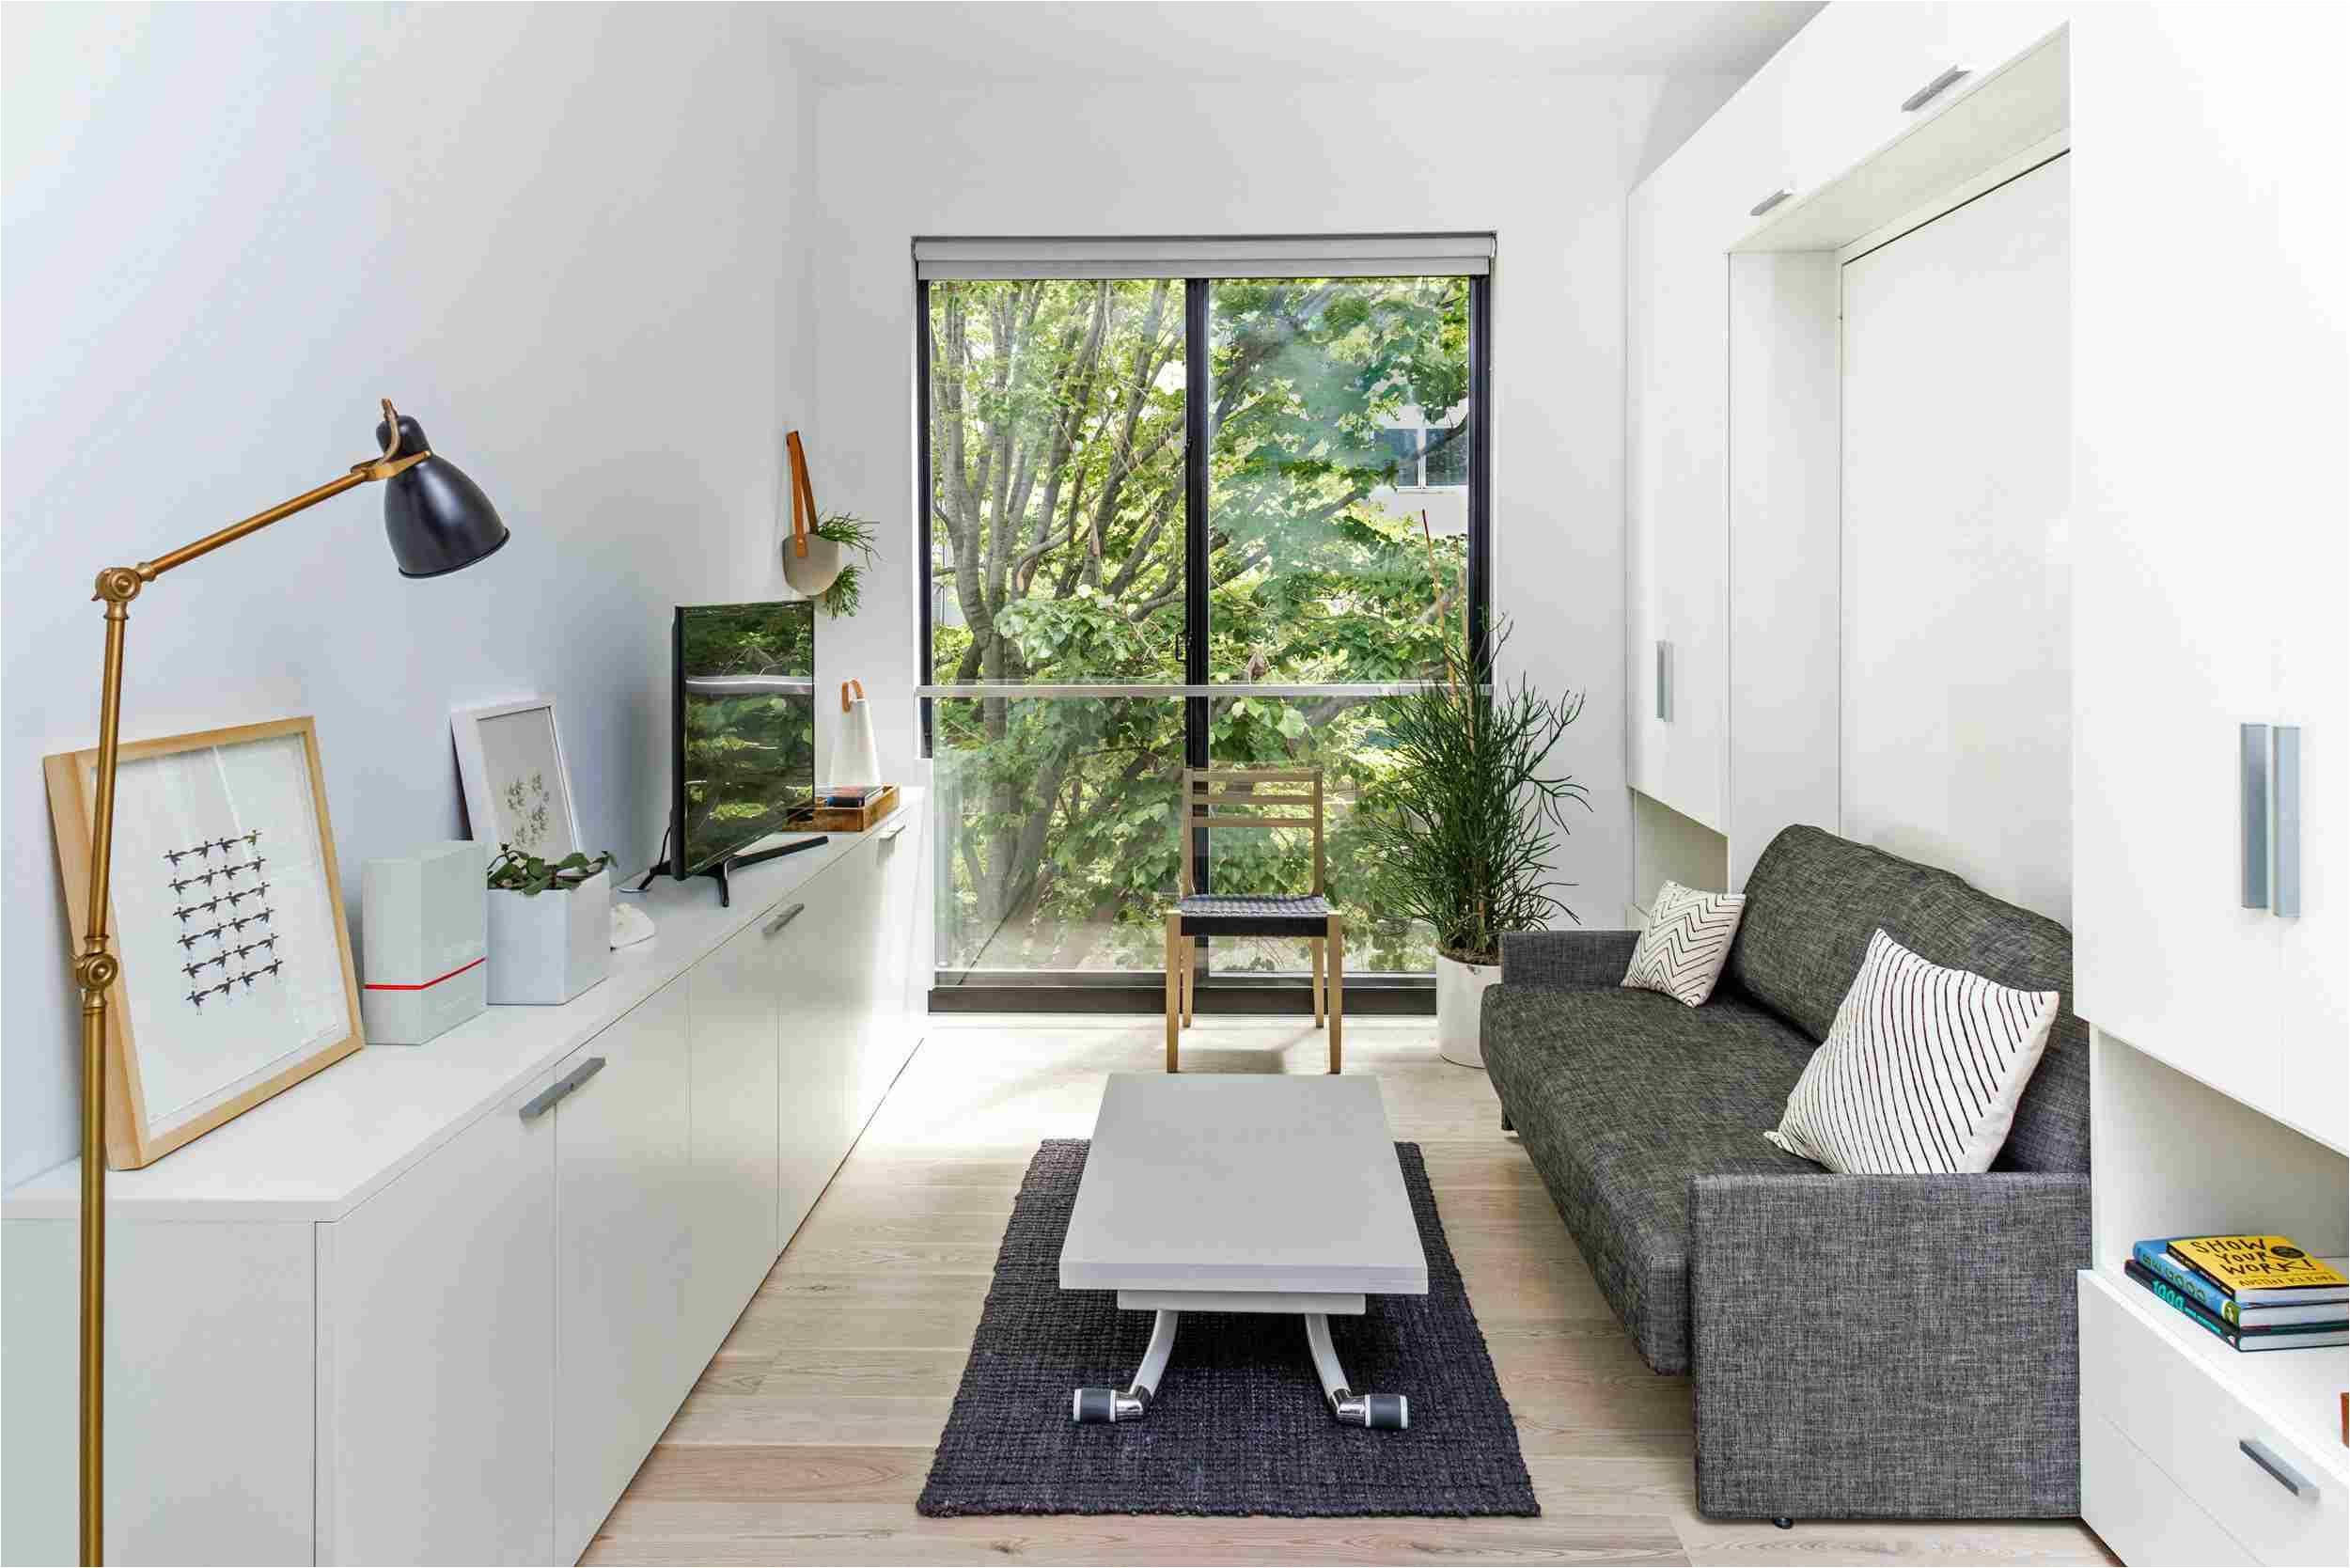 nyc micro apartment studio apartment 58793de85f9b584db345c854 jpg